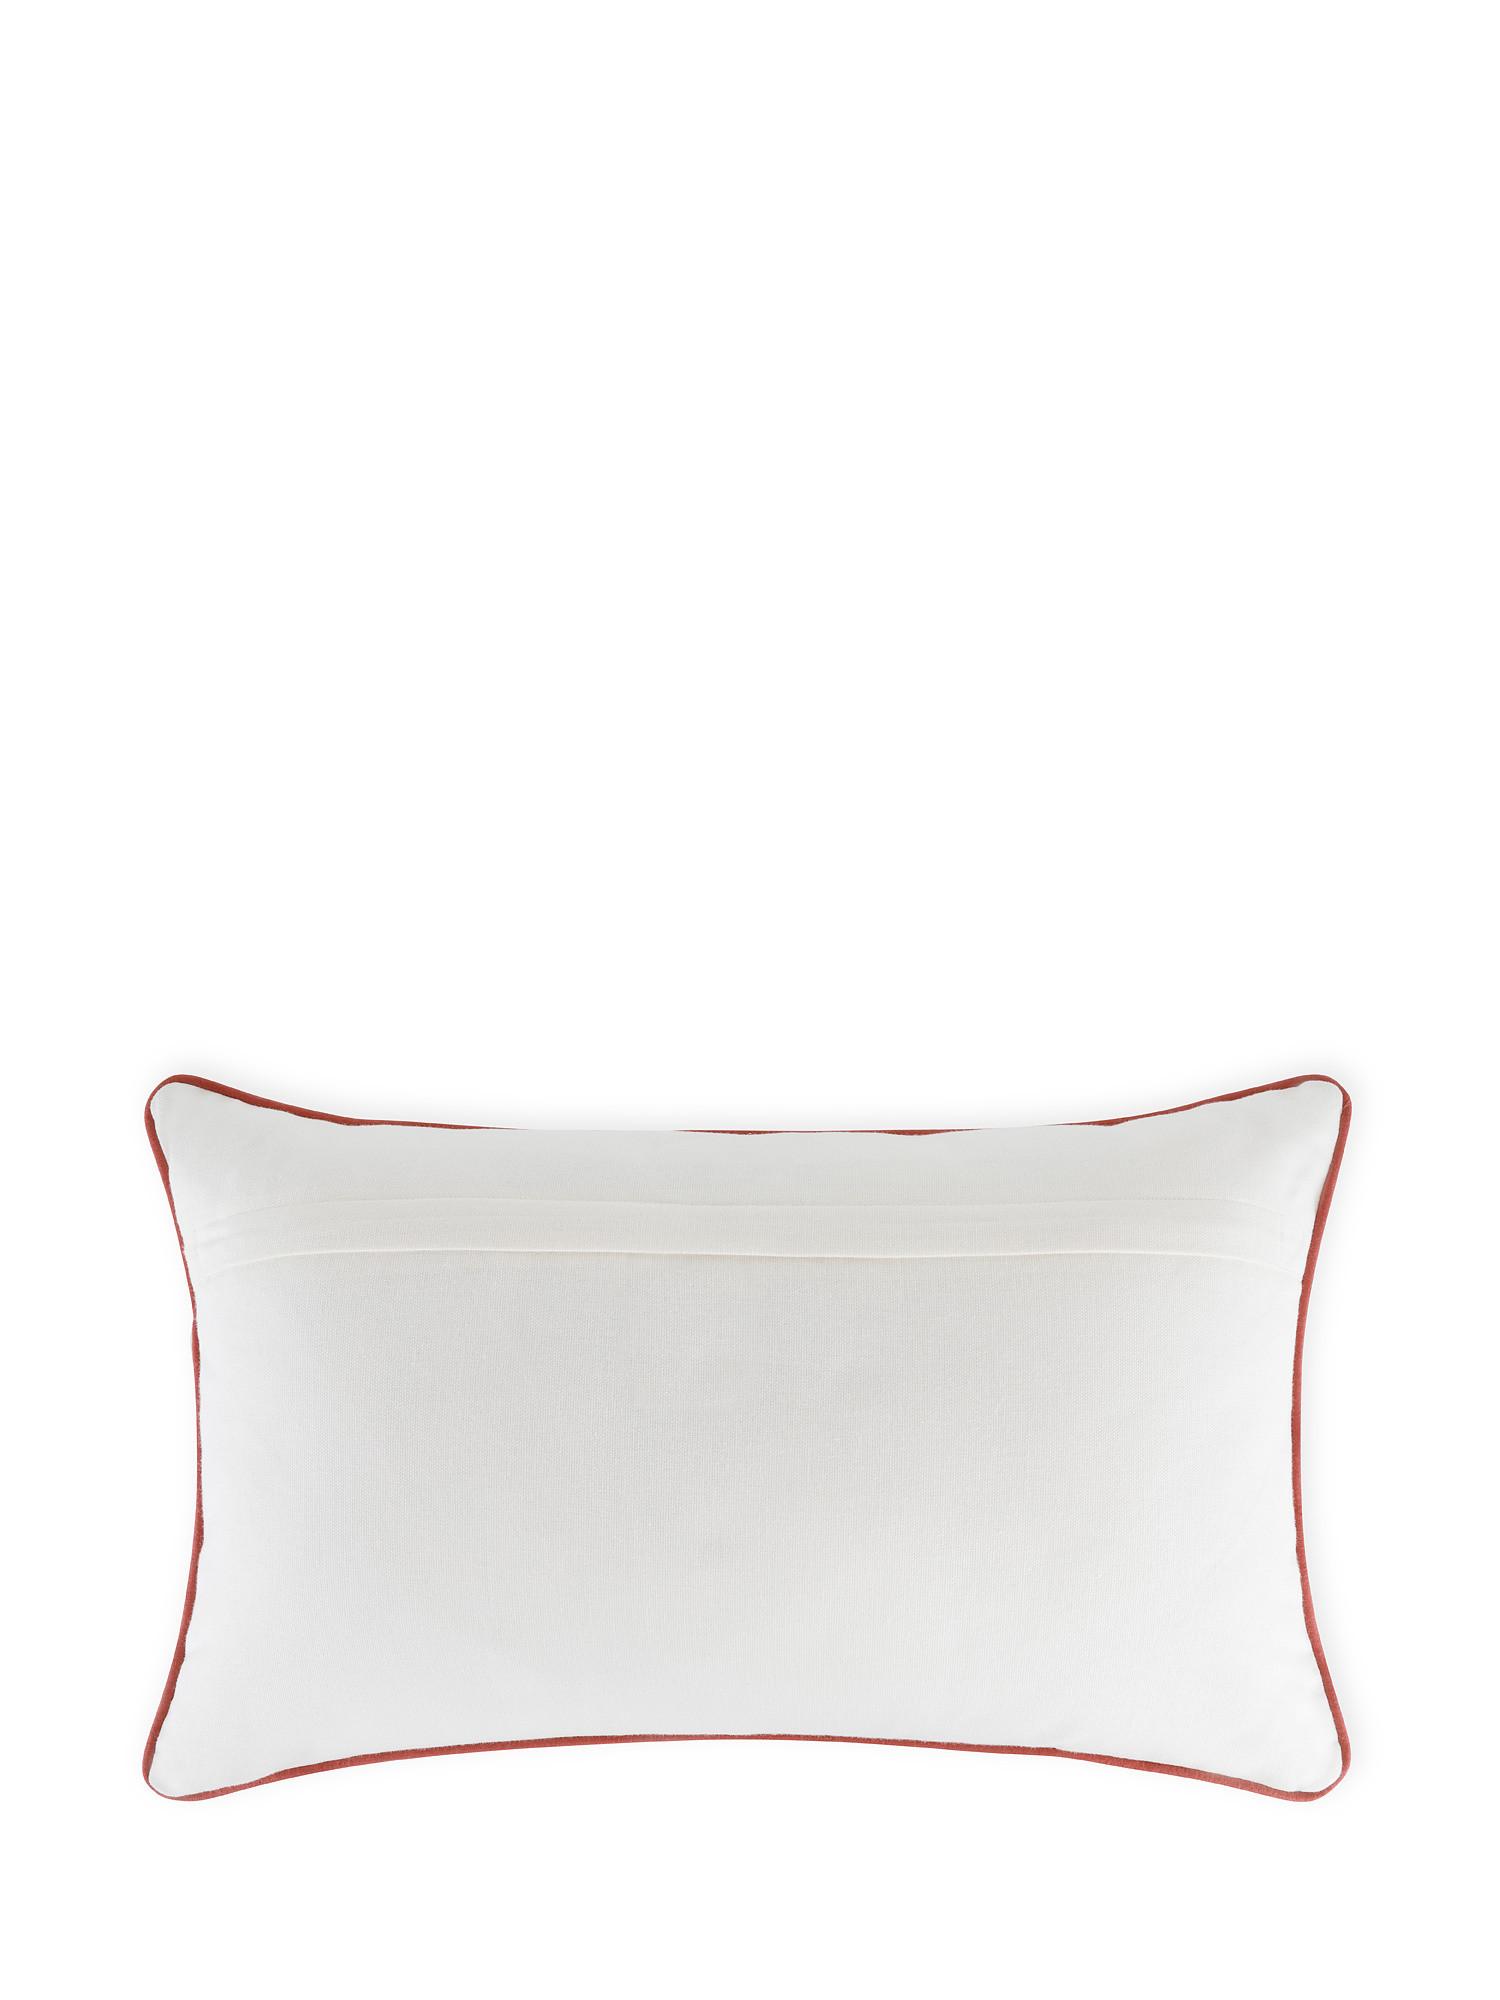 Cuscino cotone ricamo campanelle 45x45cm, Multicolor, large image number 2